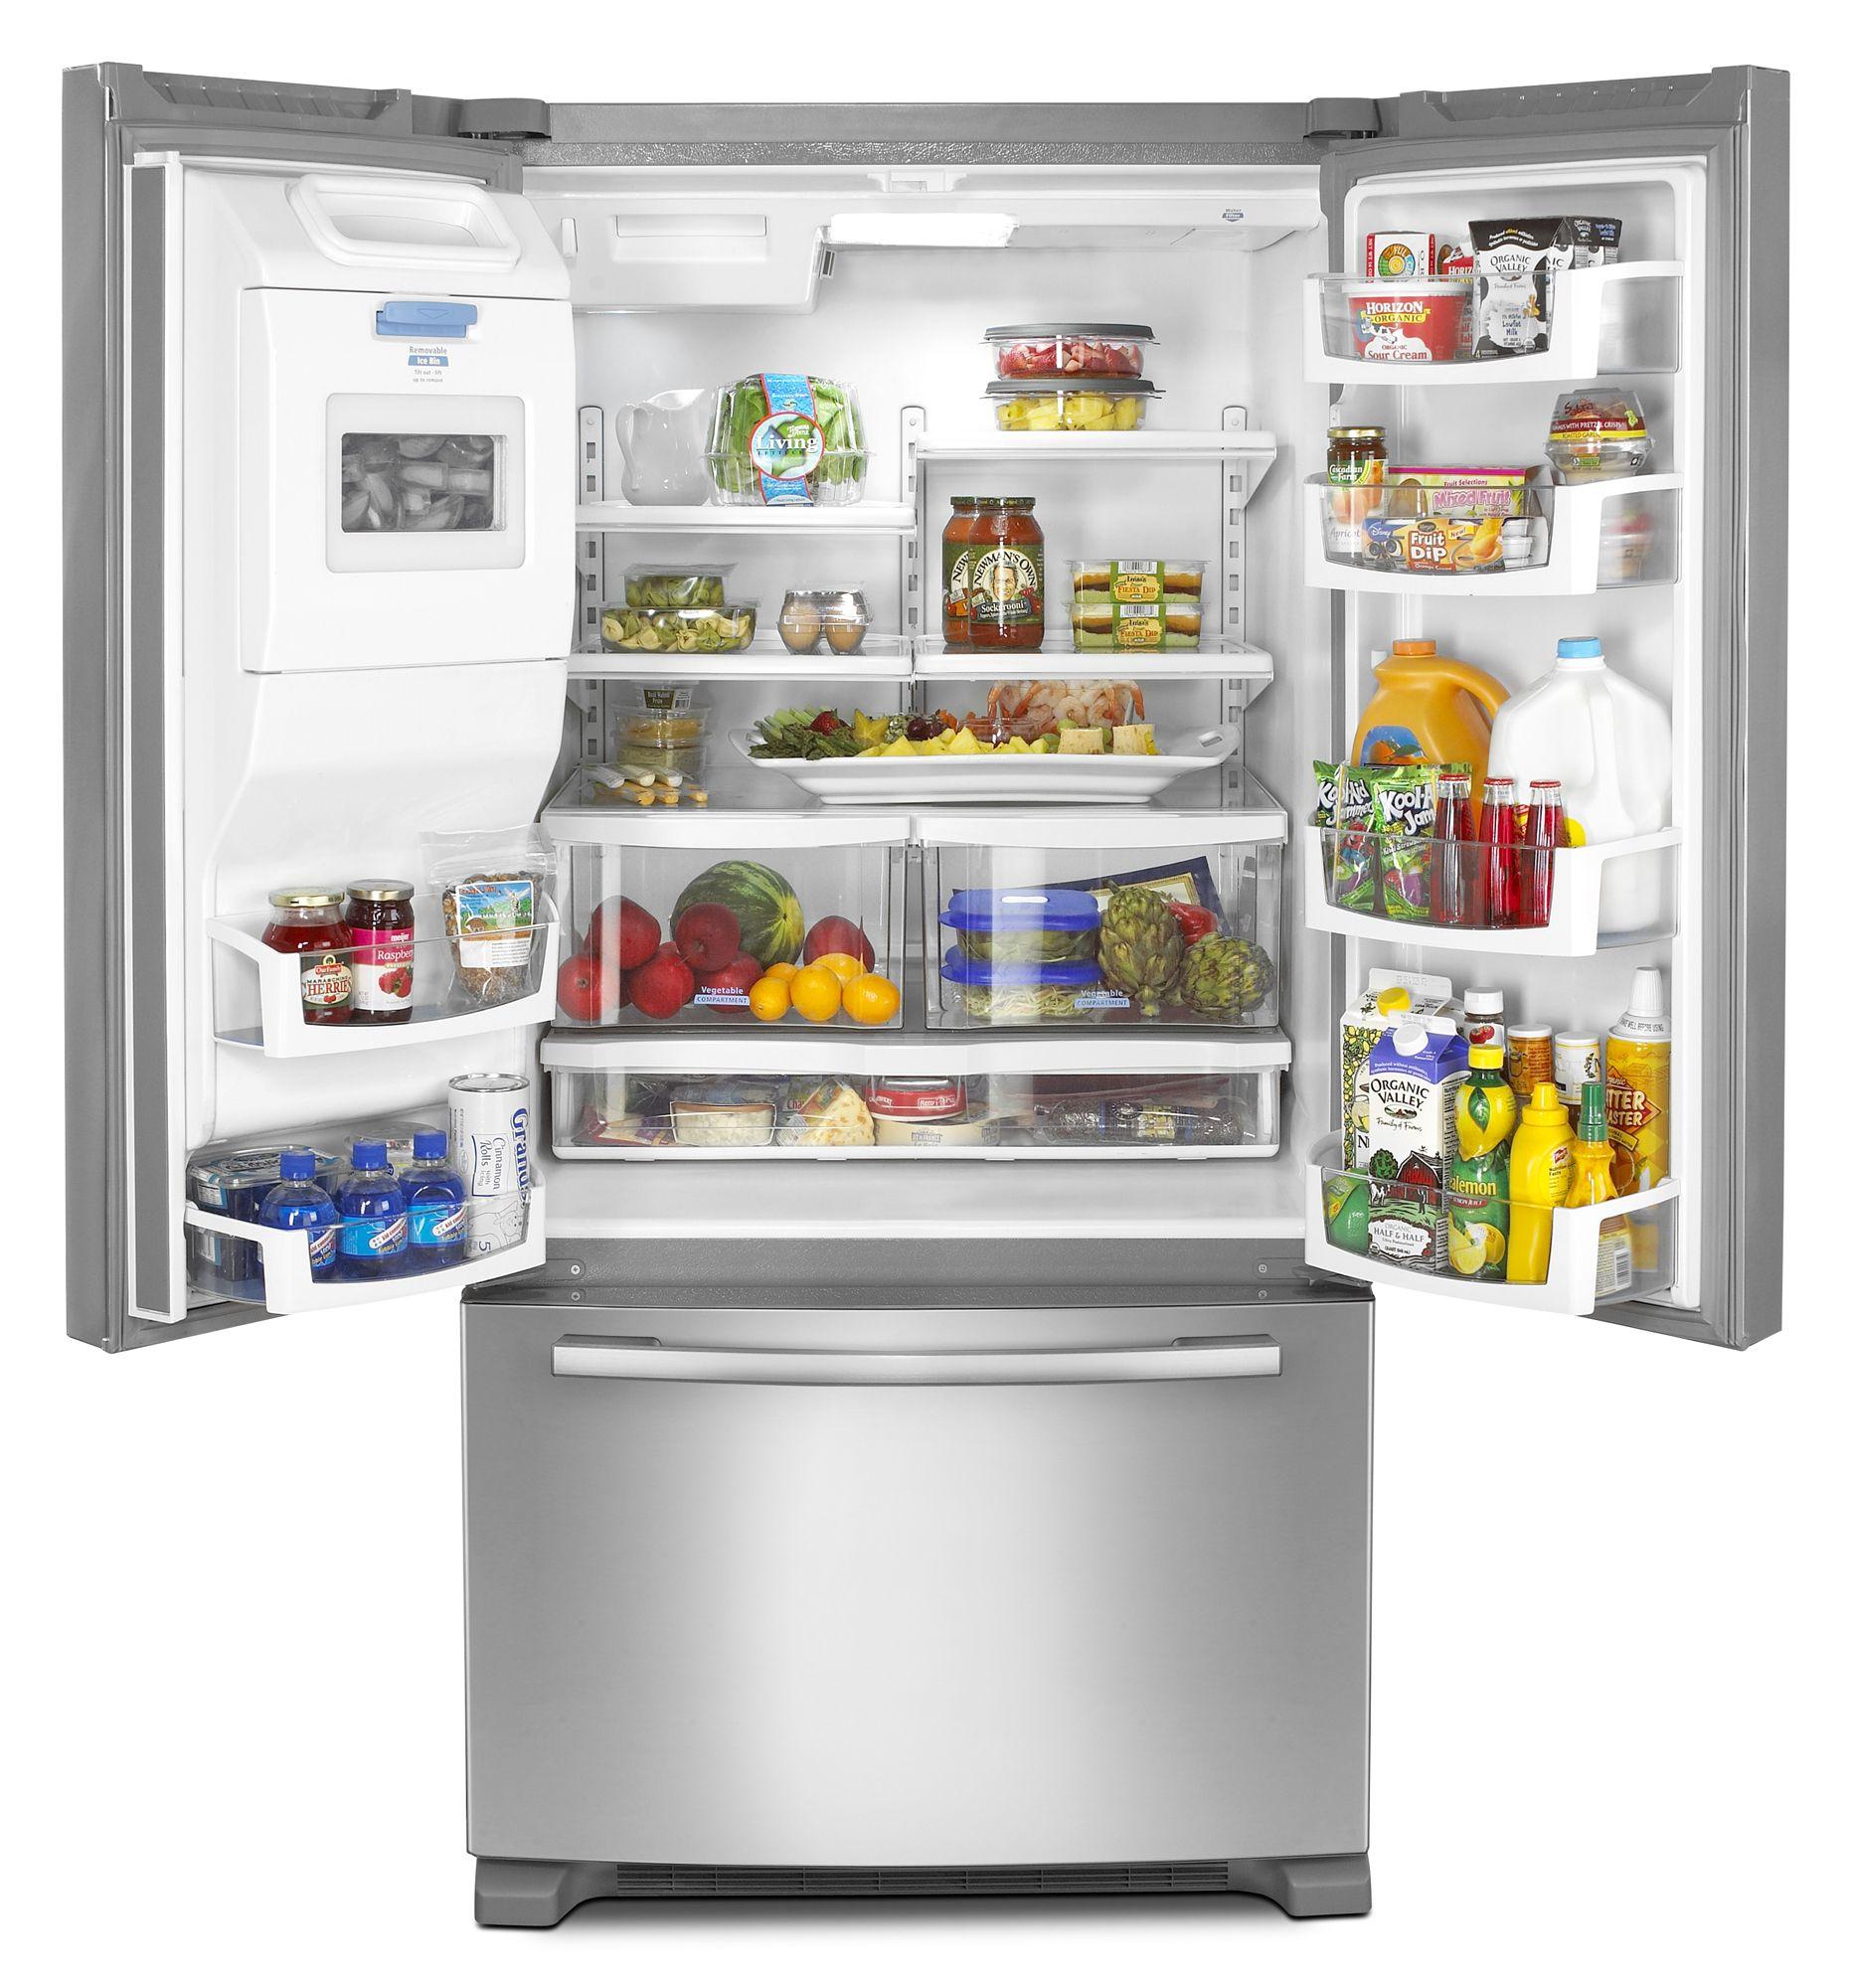 Whirlpool 26.6 cu. ft. French-Door Bottom Freezer Refrigerator w/ Ice & Water Dispenser (GI7FVCXW)